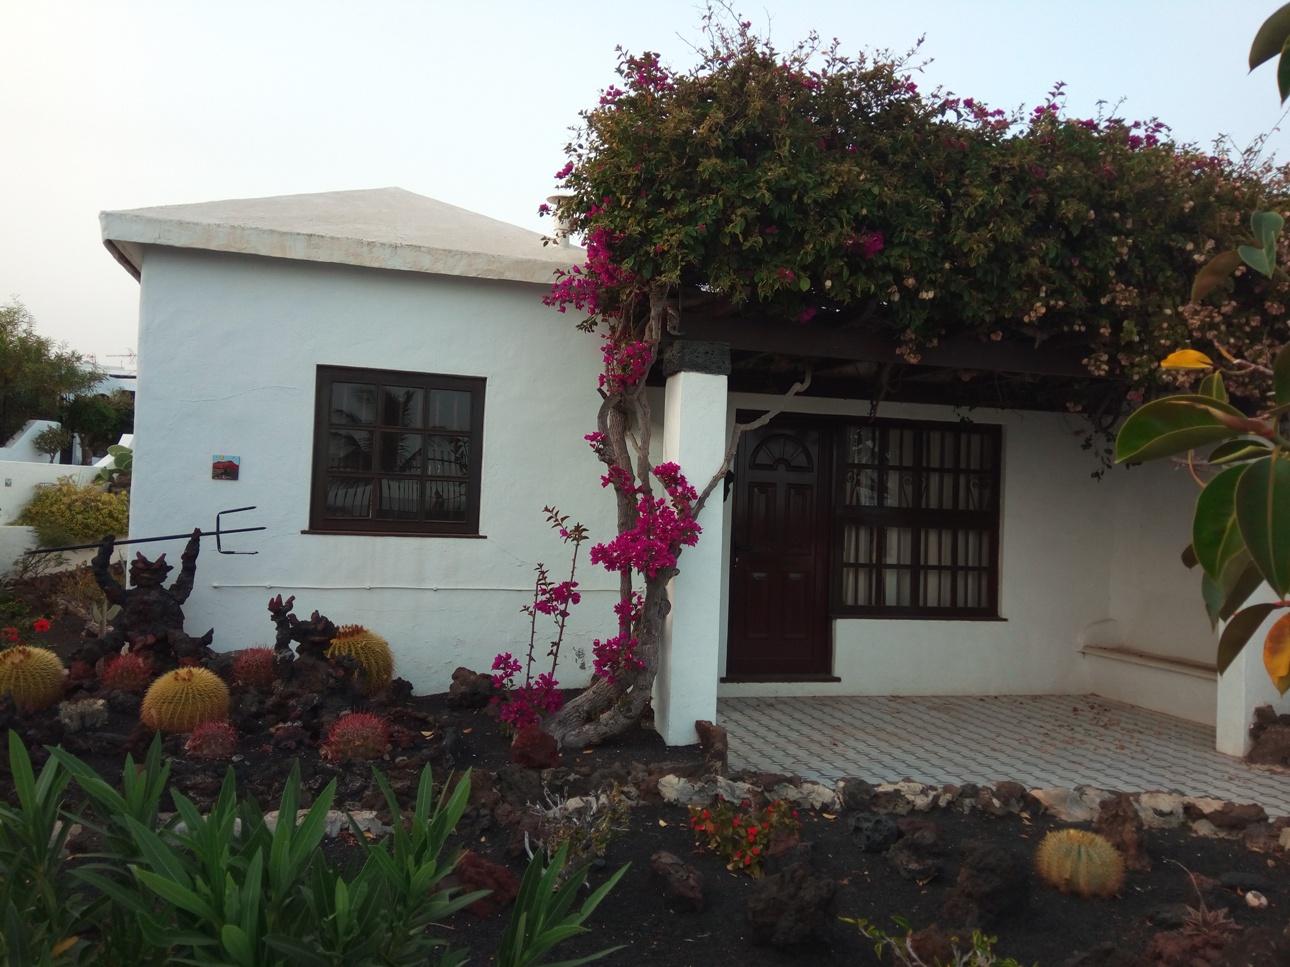 Двор в Пуерто де ла Кармен, Лансароте